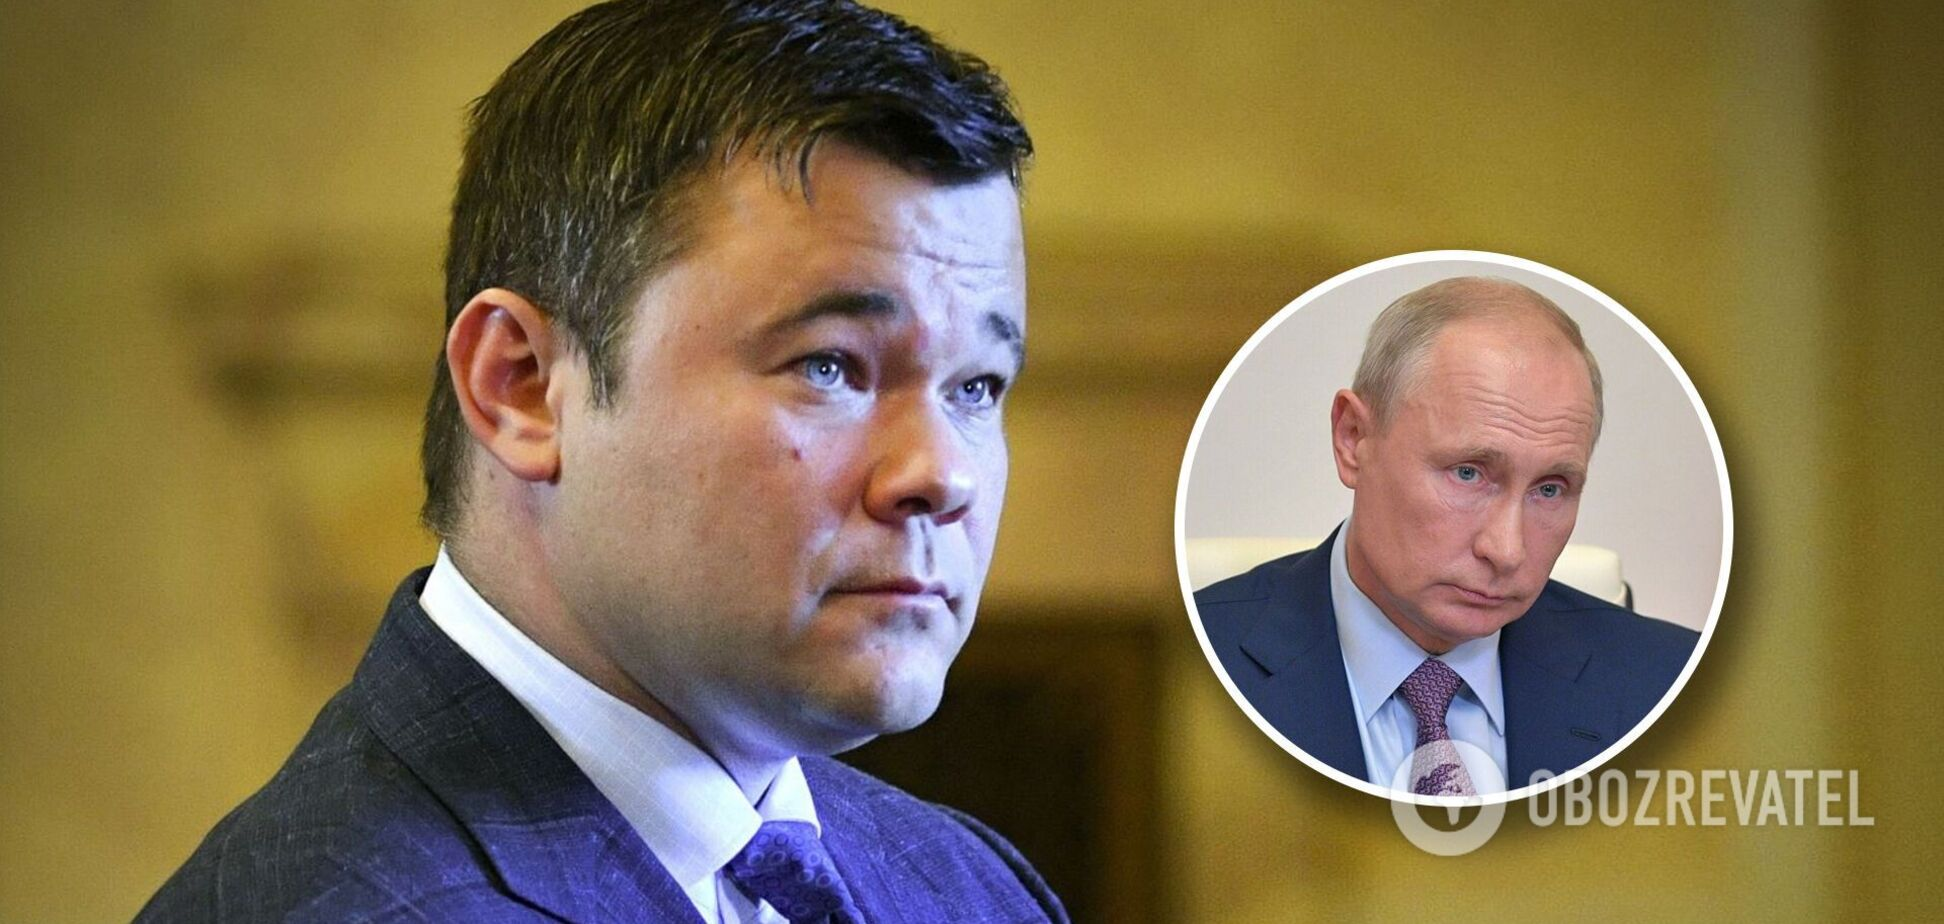 Богдан обратился к Путину